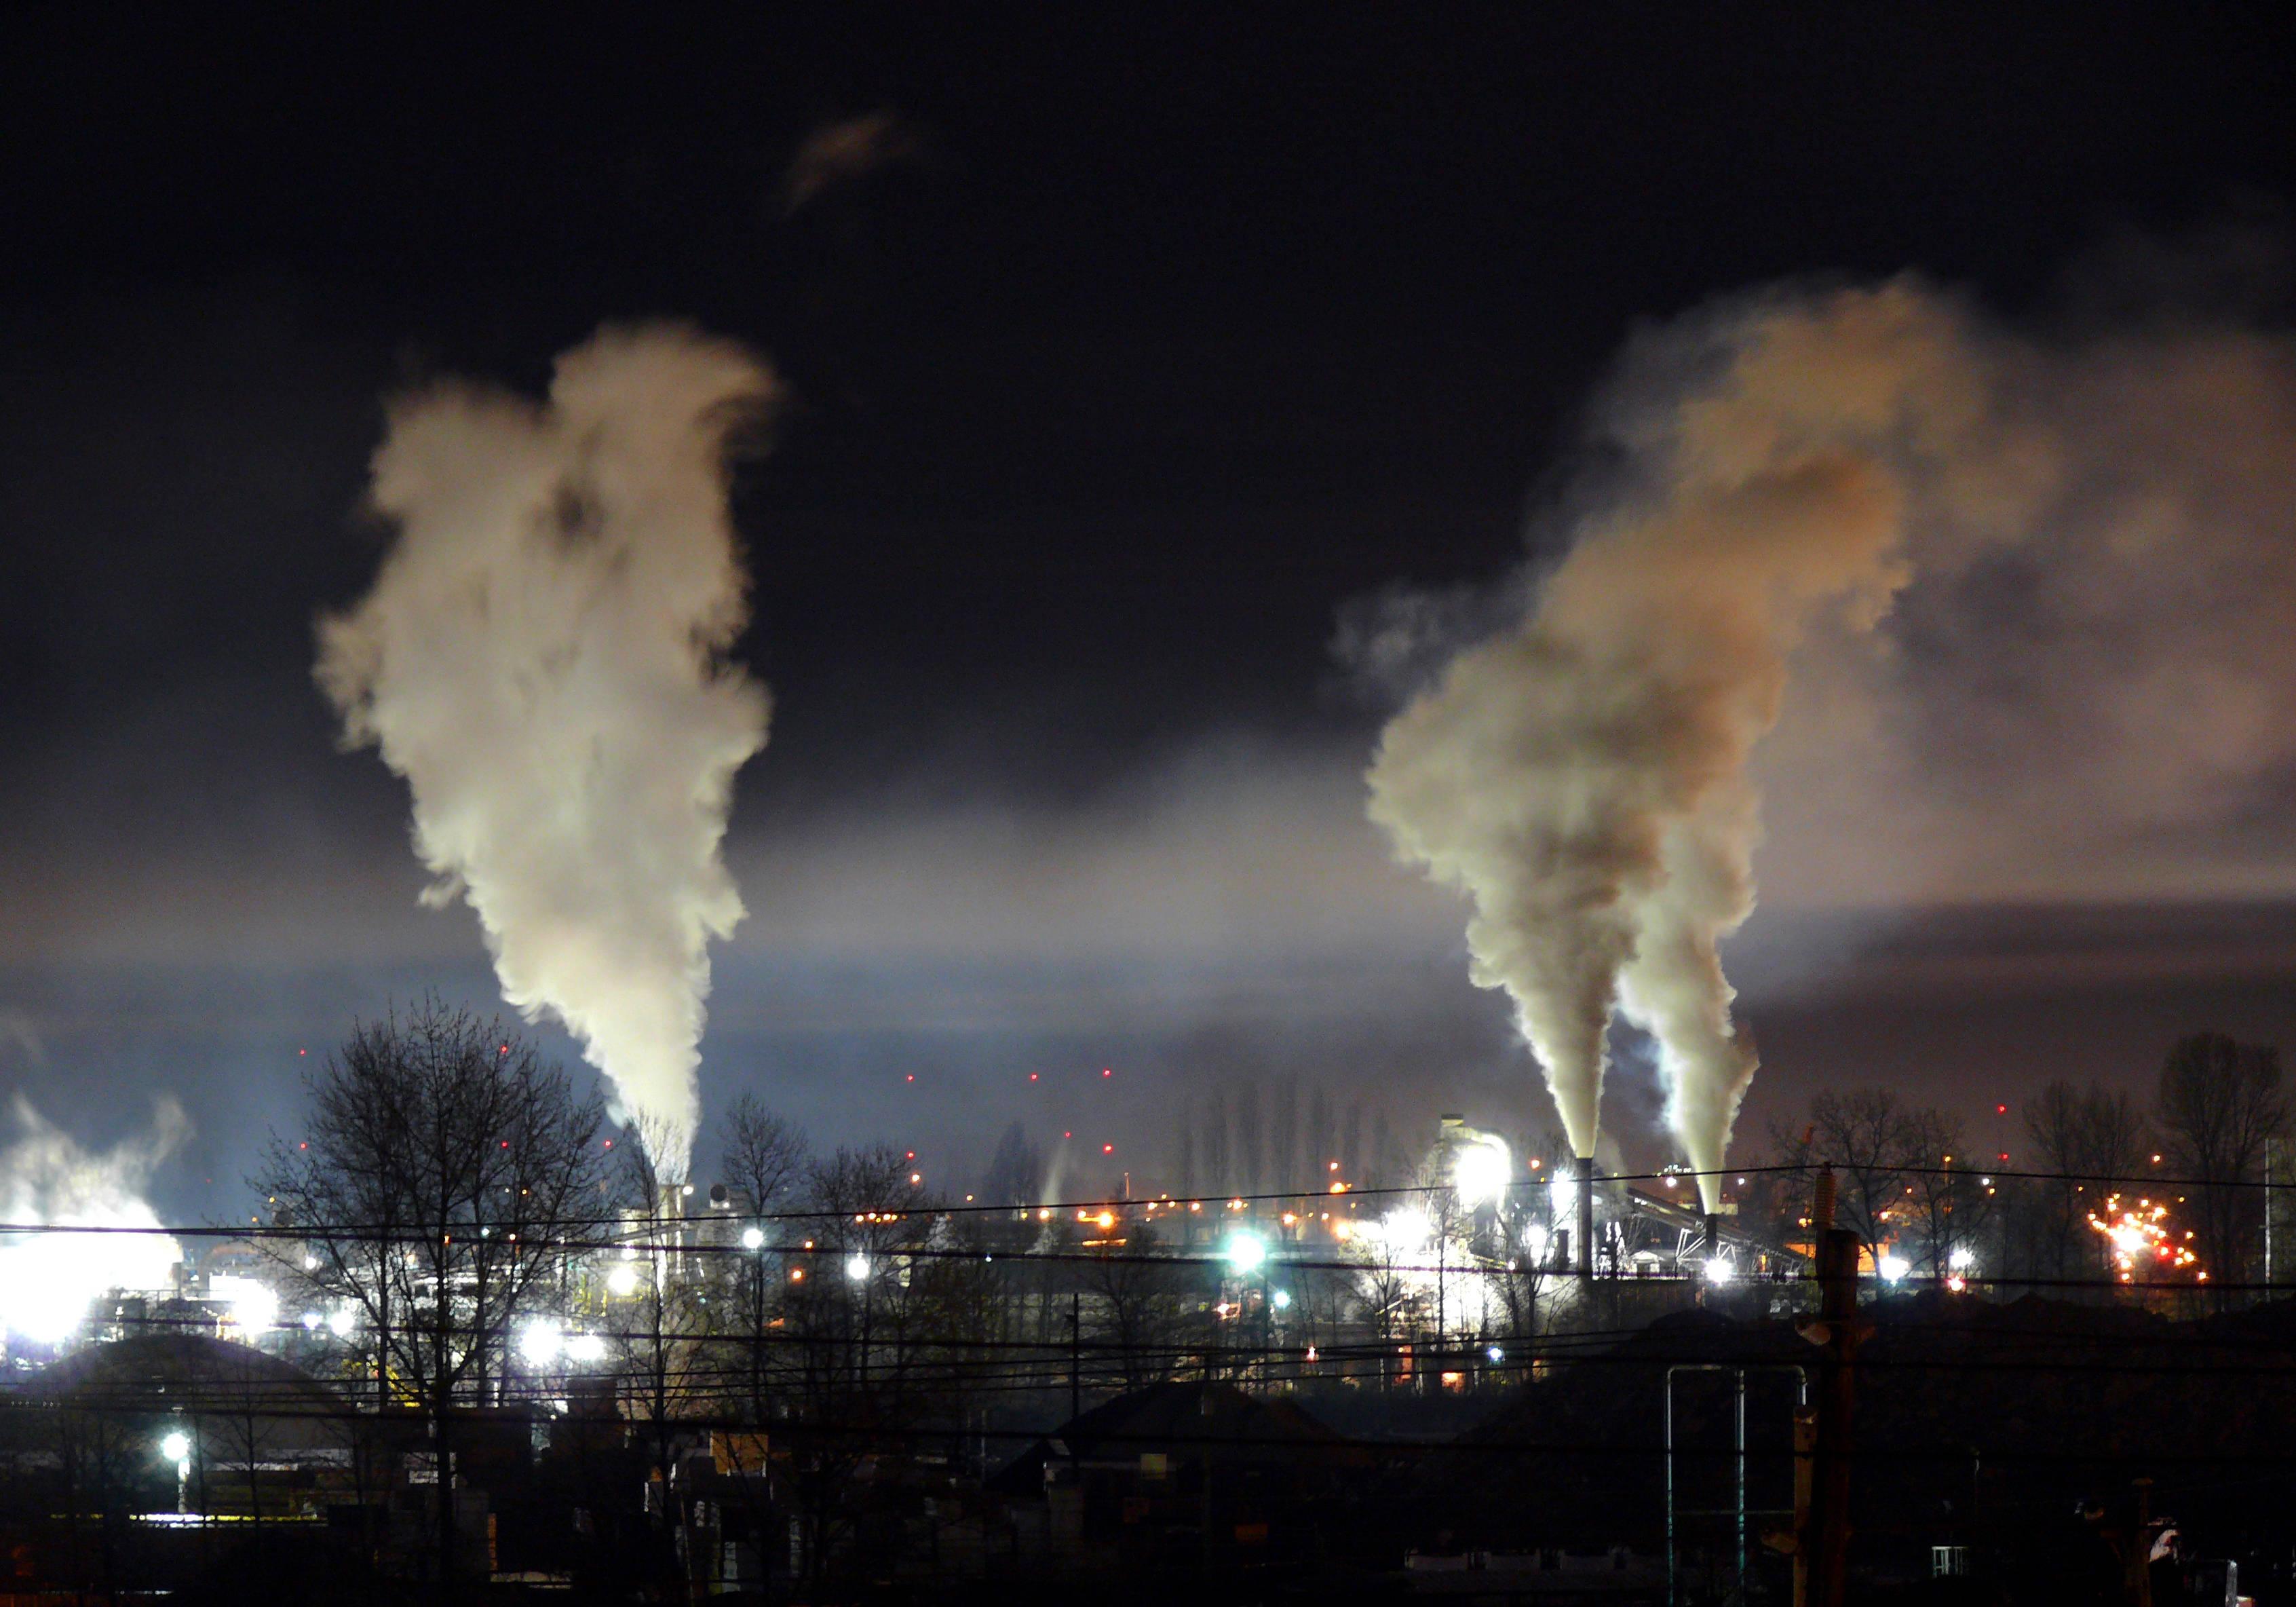 ddf196fb595fd36e5b7b_Heavy_night_industrial_light_pollution.jpg